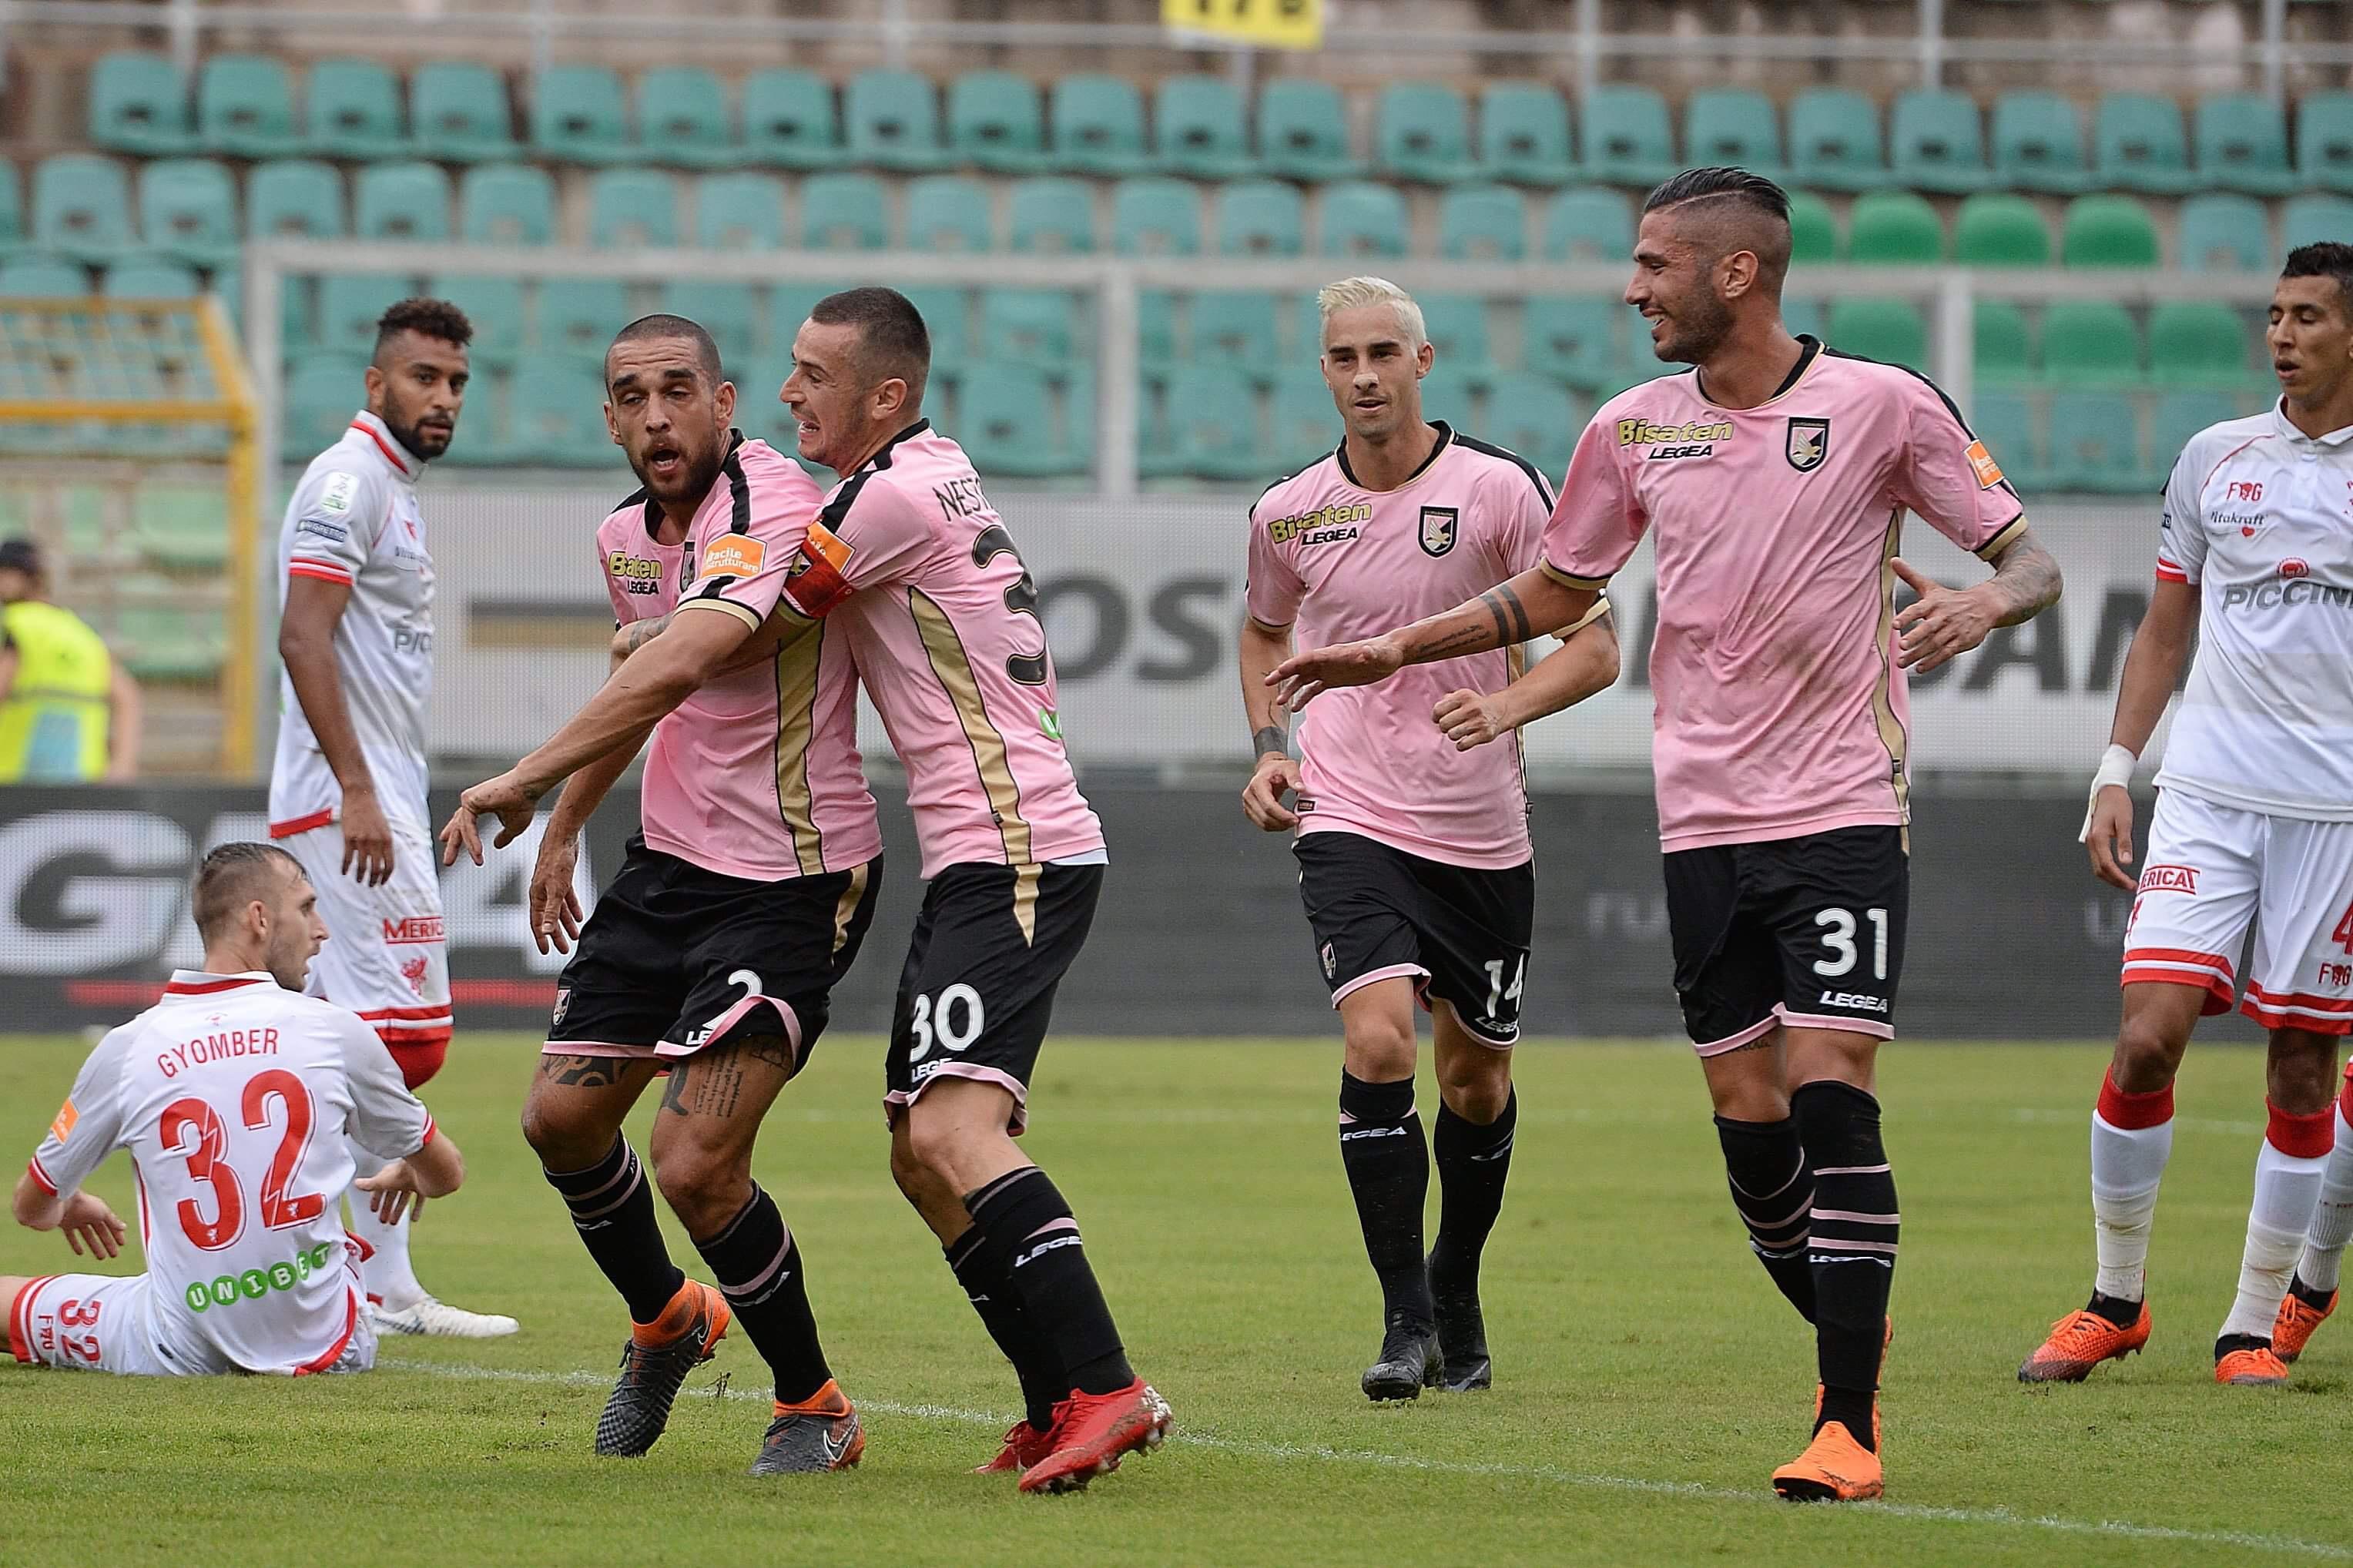 Palermo perugia